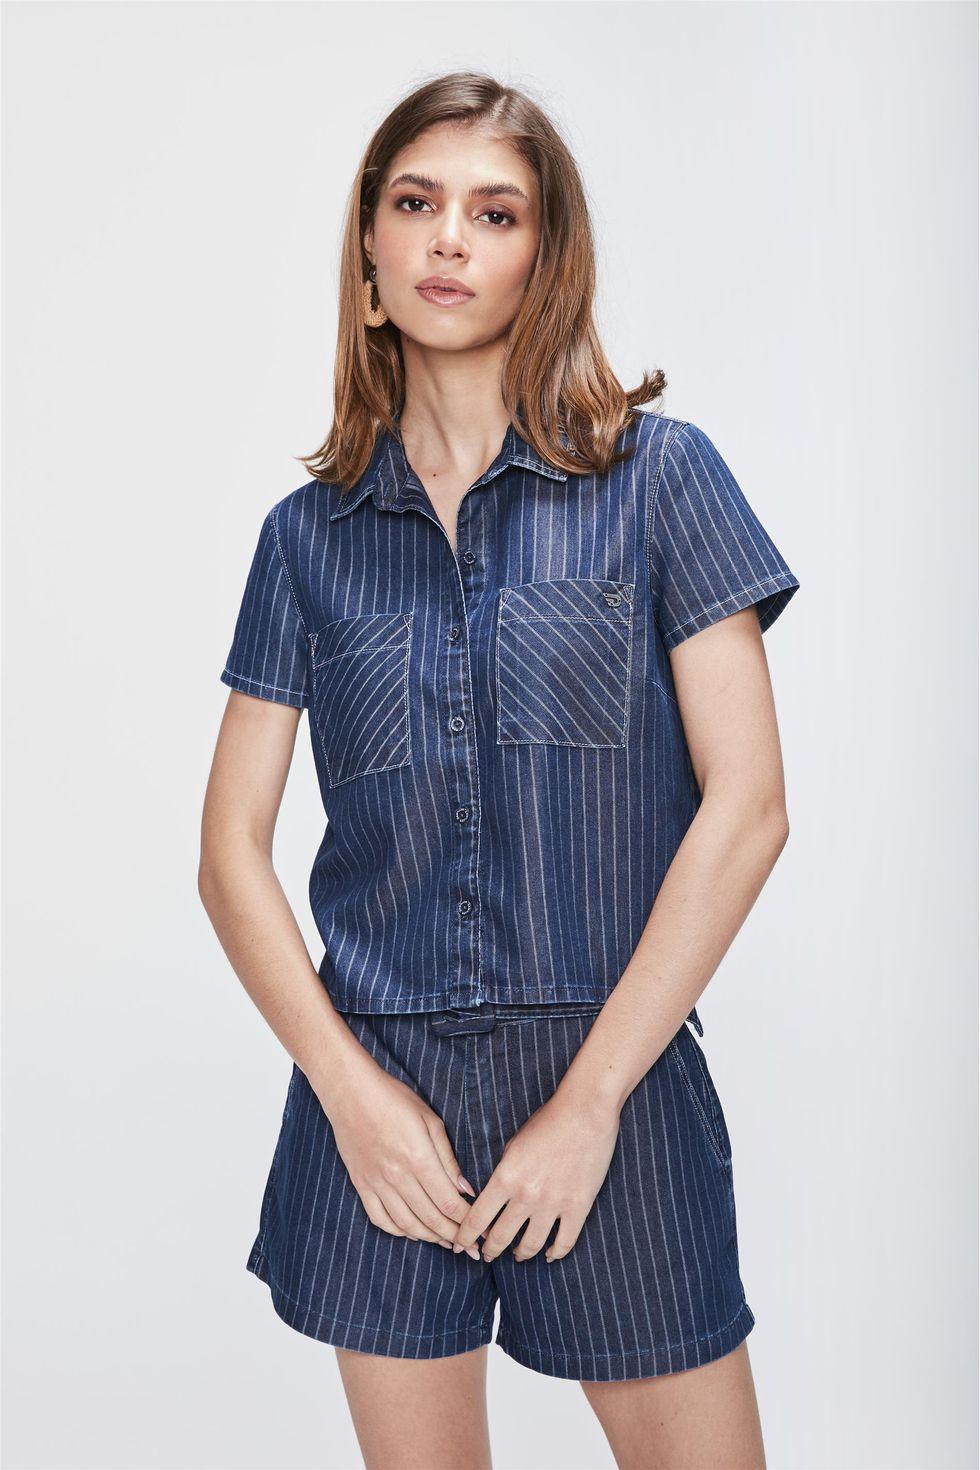 Camisa-Cropped-Jeans-Risca-de-Giz-Frente--